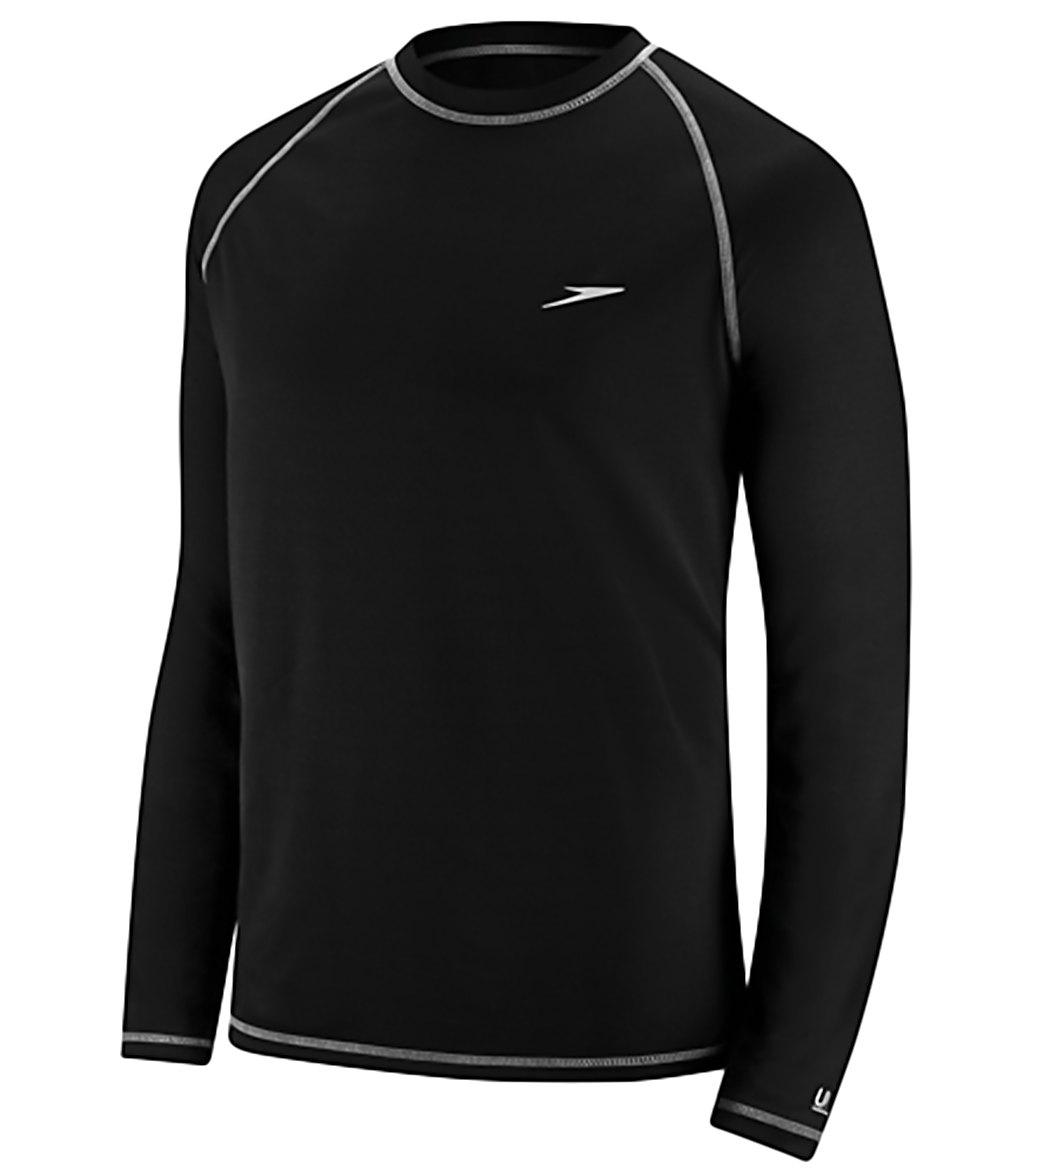 swims shirts speedo menu0027s easy long sleeve swim shirt FECBIJB